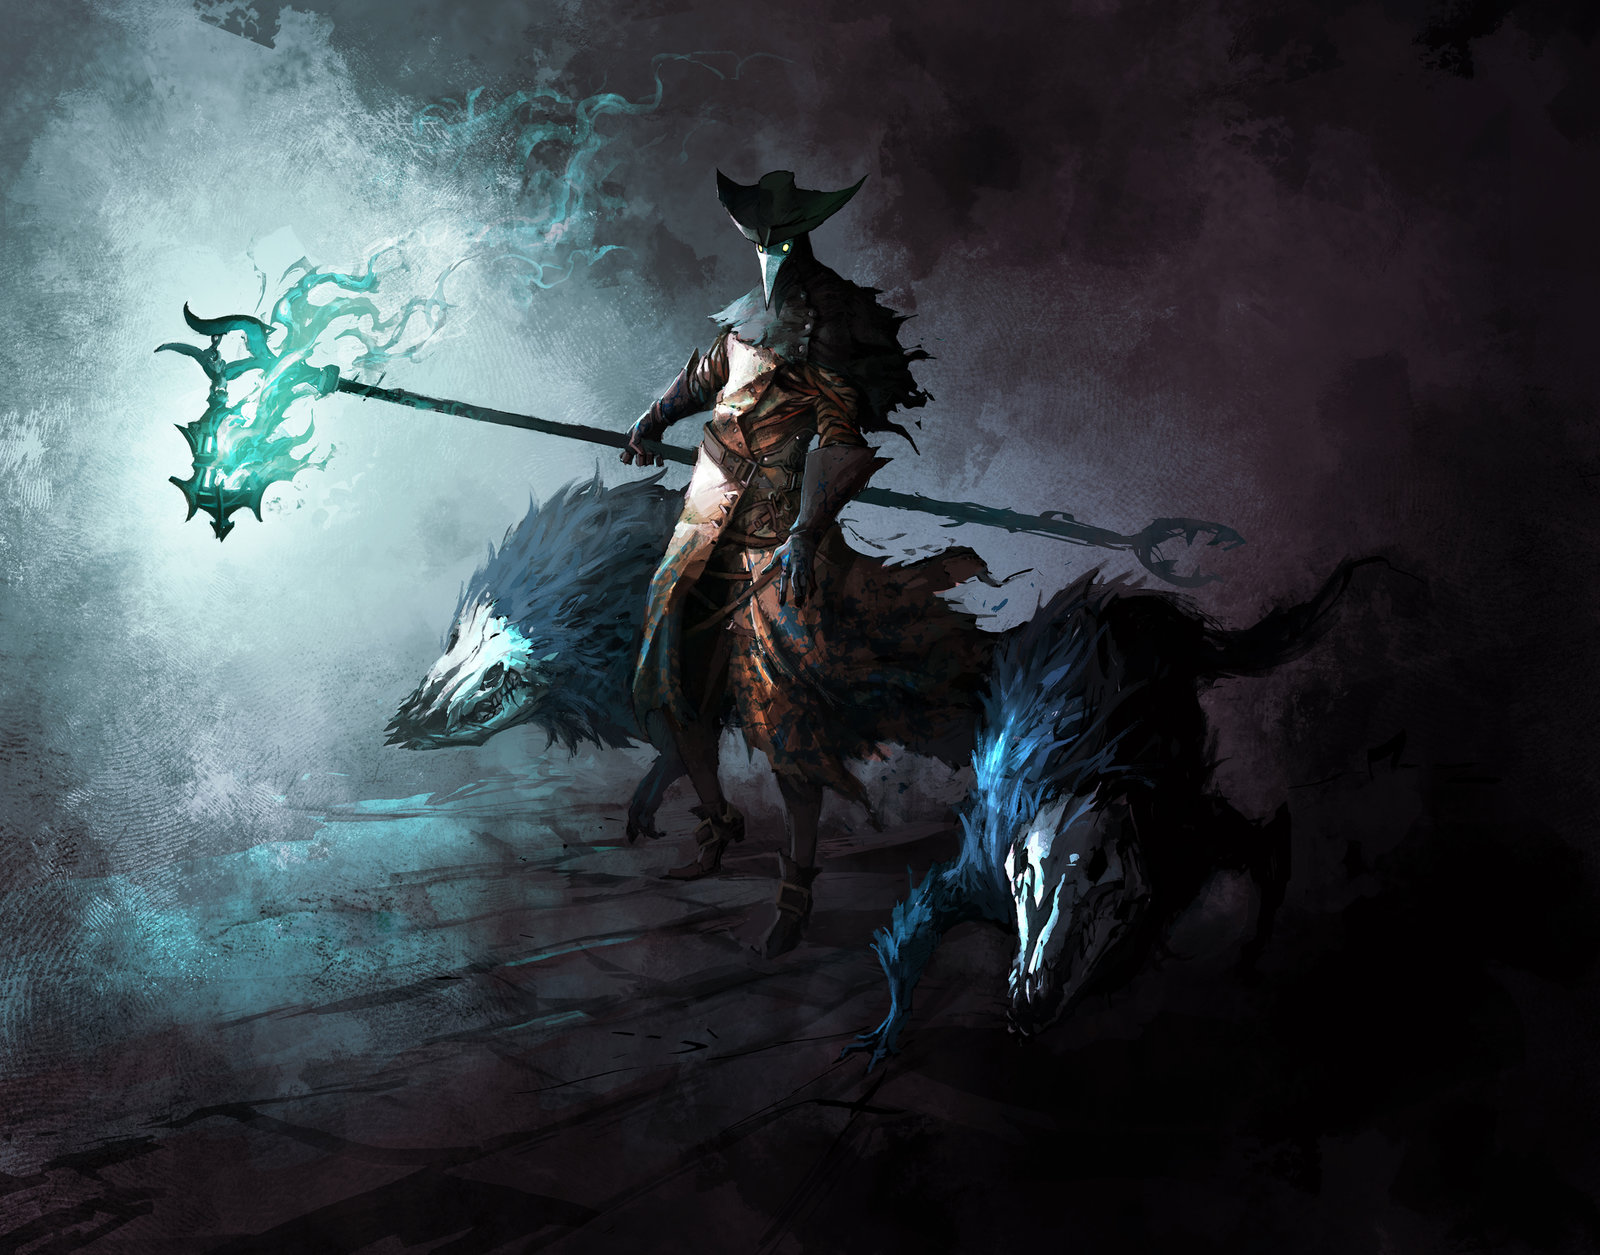 ArtStation - Castlevania Mirror of Fate Night Watchman Concept Art